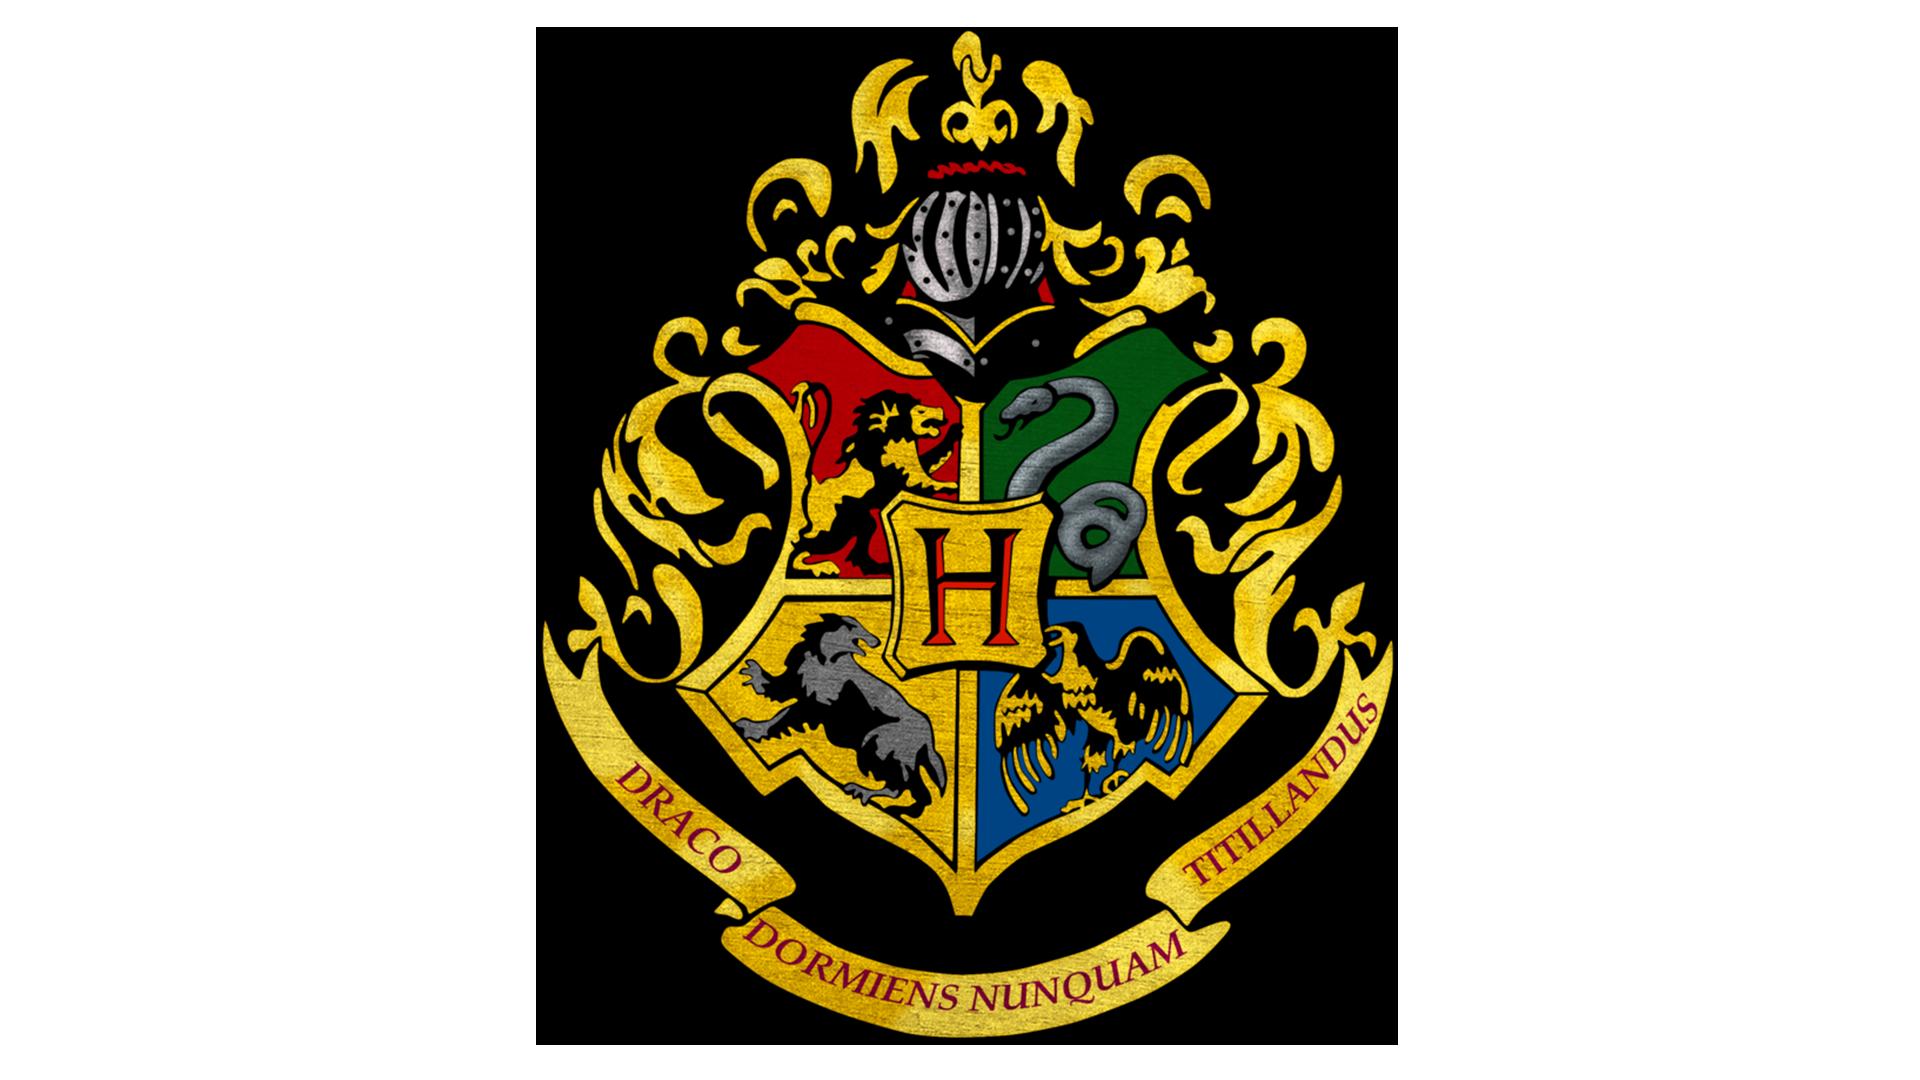 hogwarts crest png 10 free Cliparts | Download images on ...